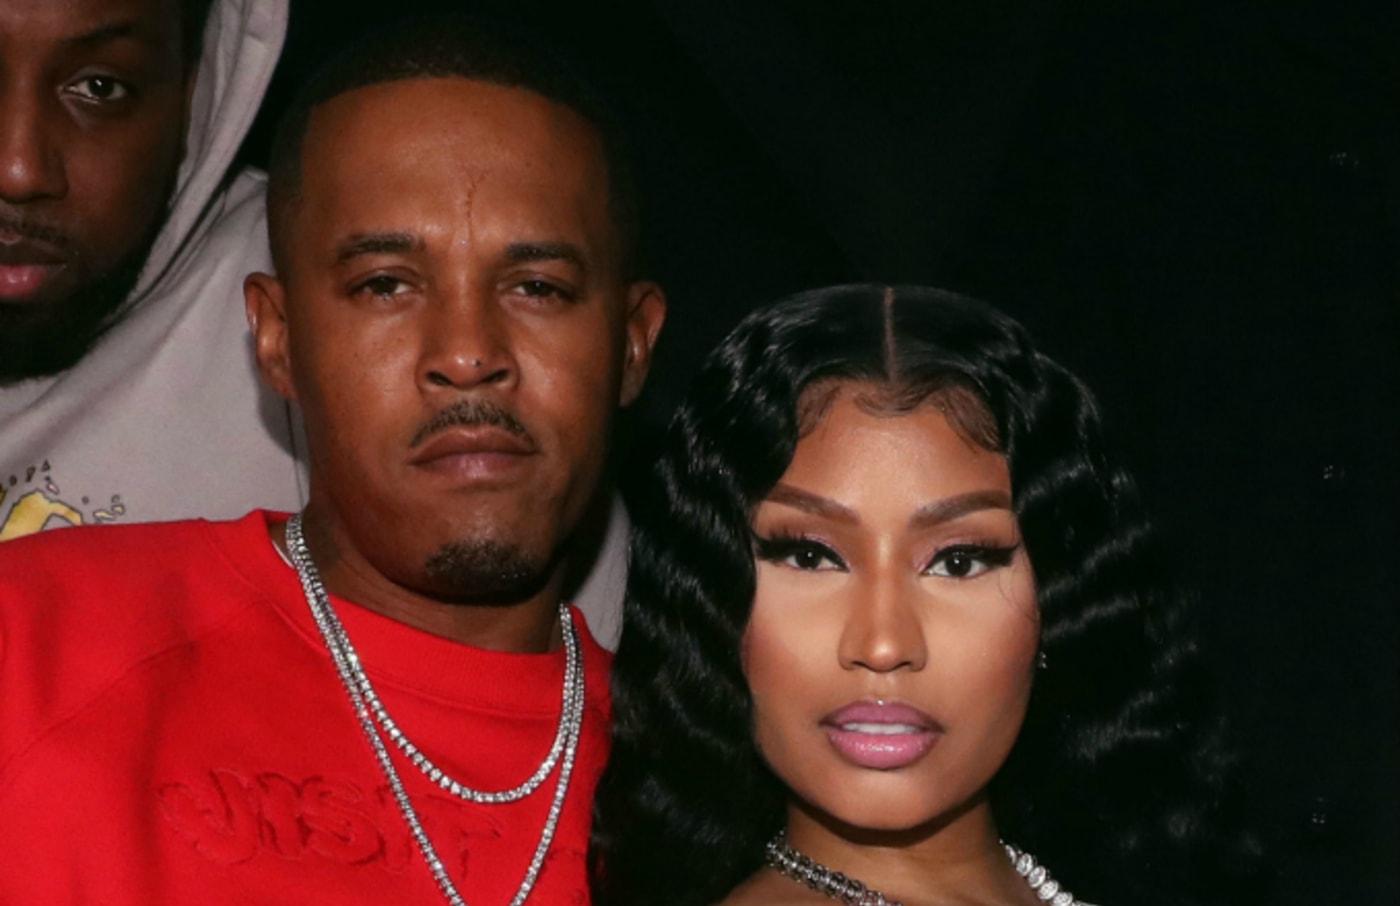 Kenneth Zoo Petty (L) and Nicki Minaj